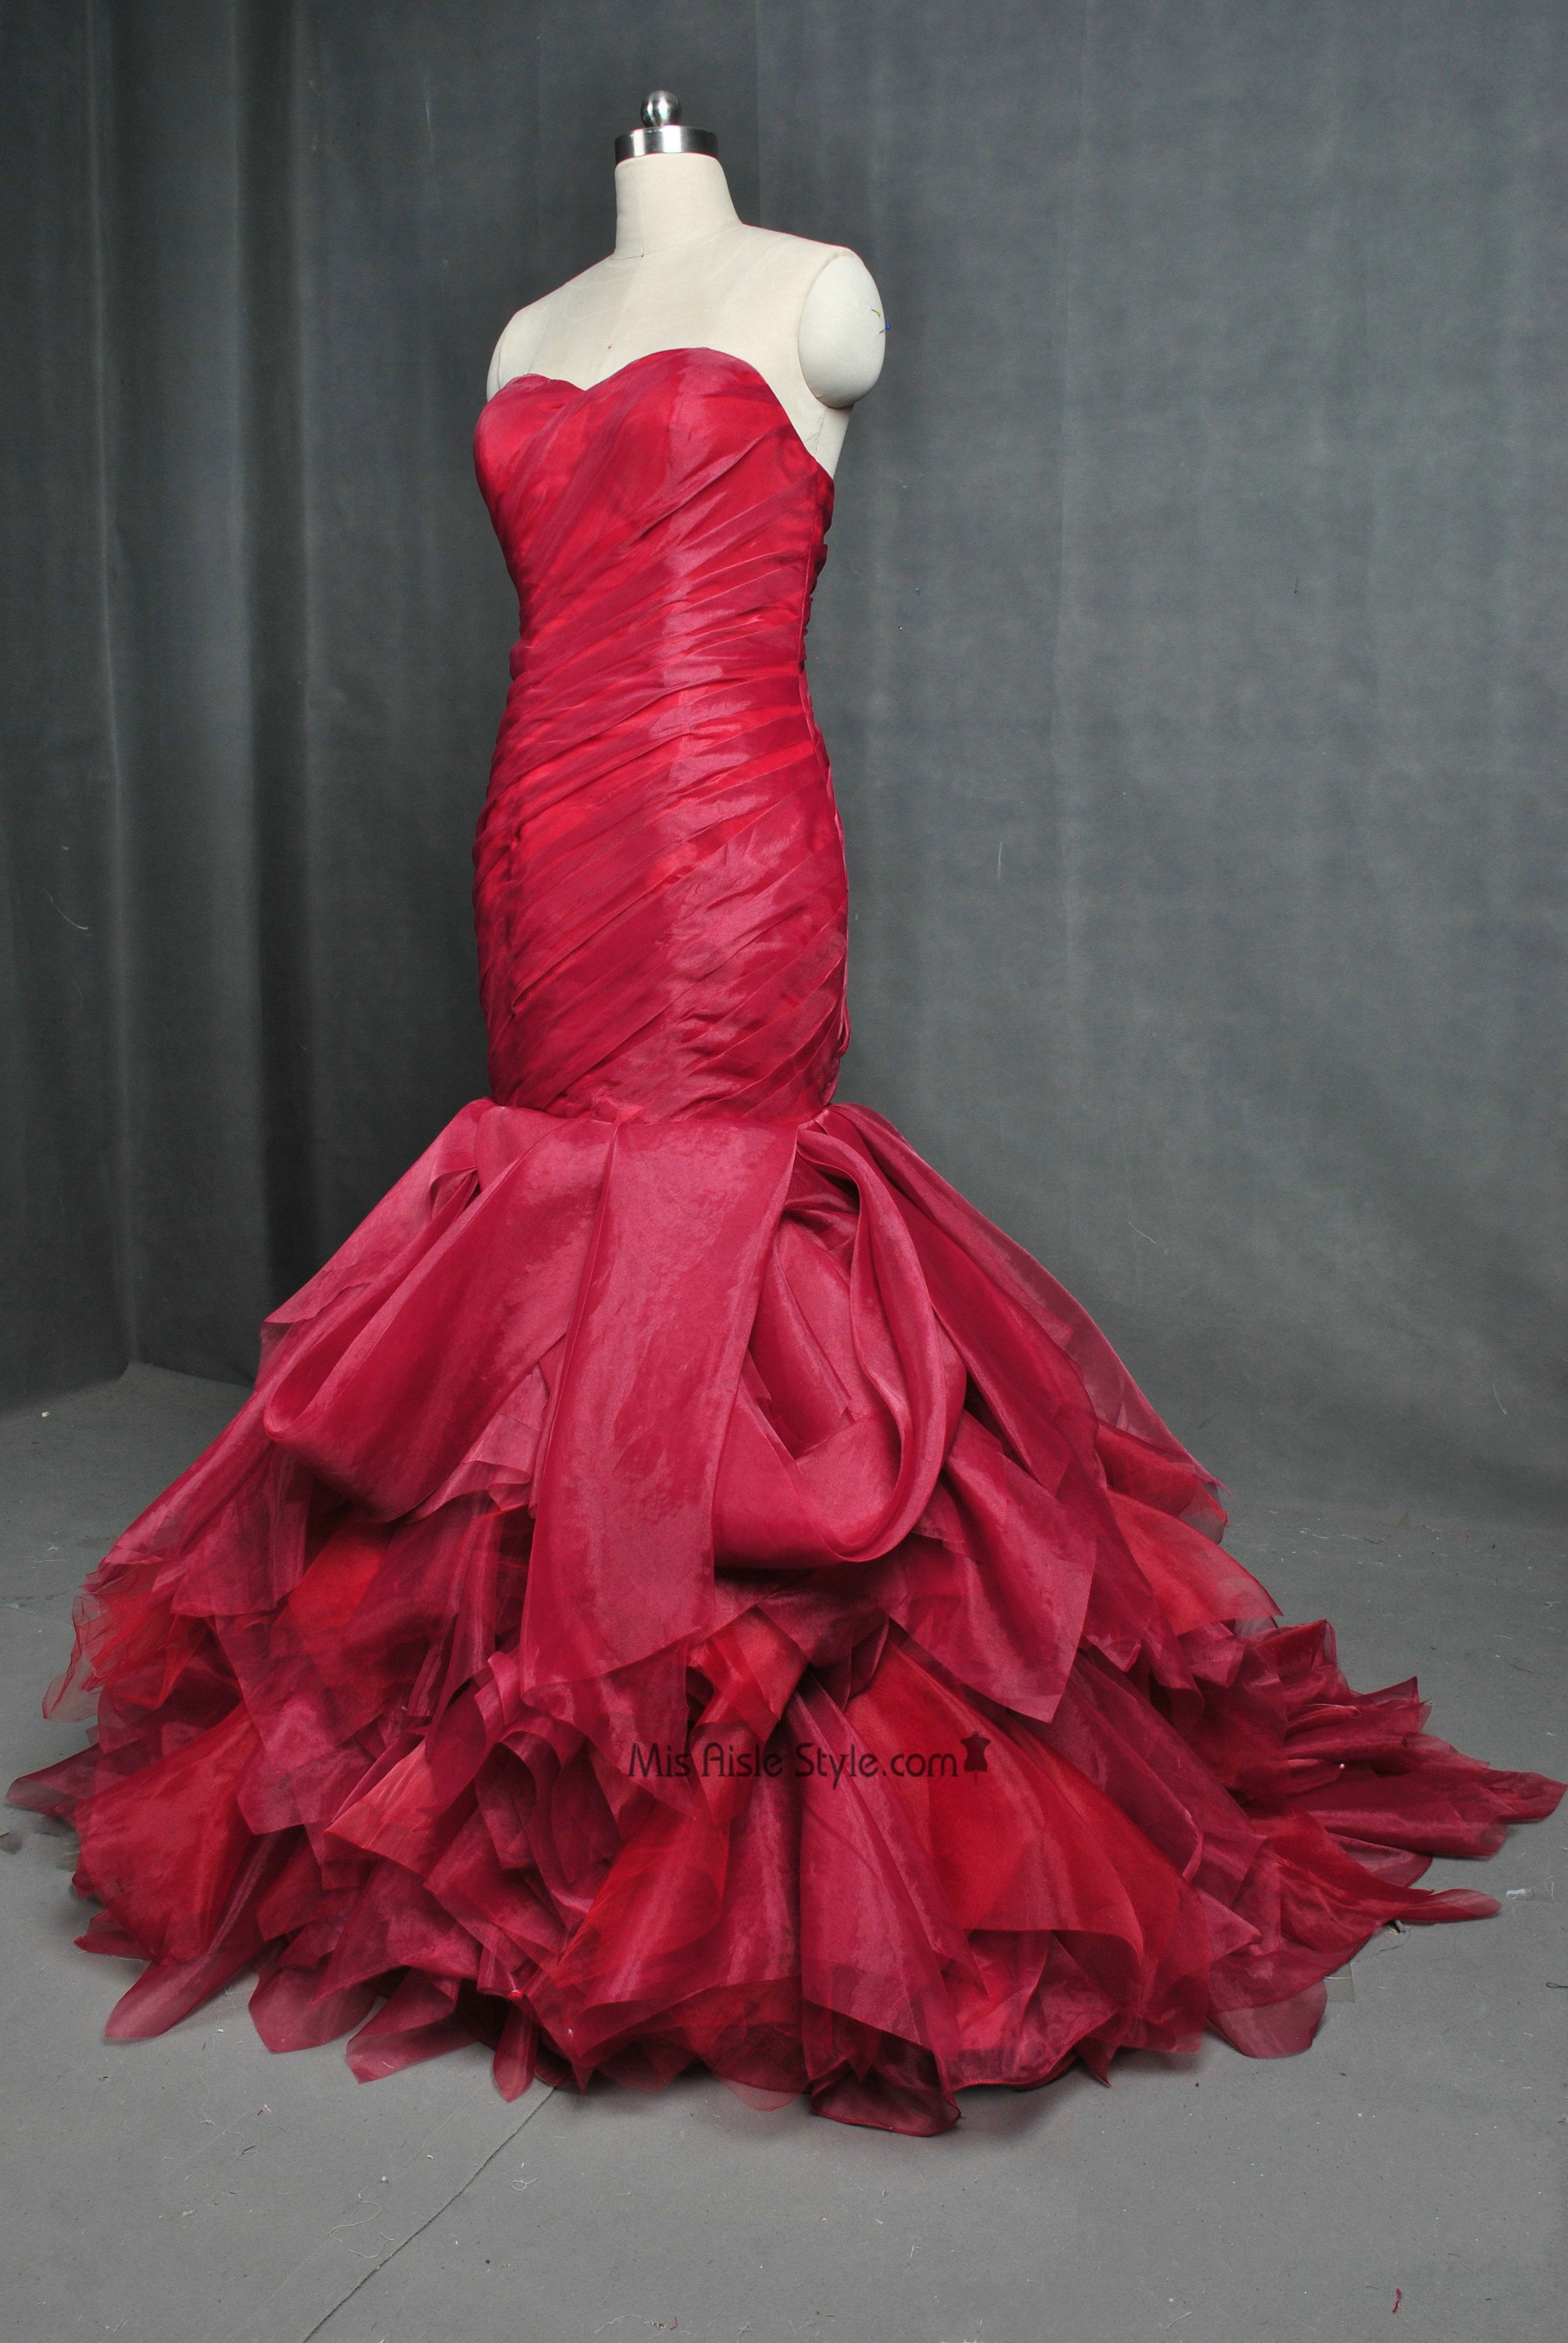 Elegant Mermaid Dark Red Wedding Dress   Wedding Dresses   Pinterest ...